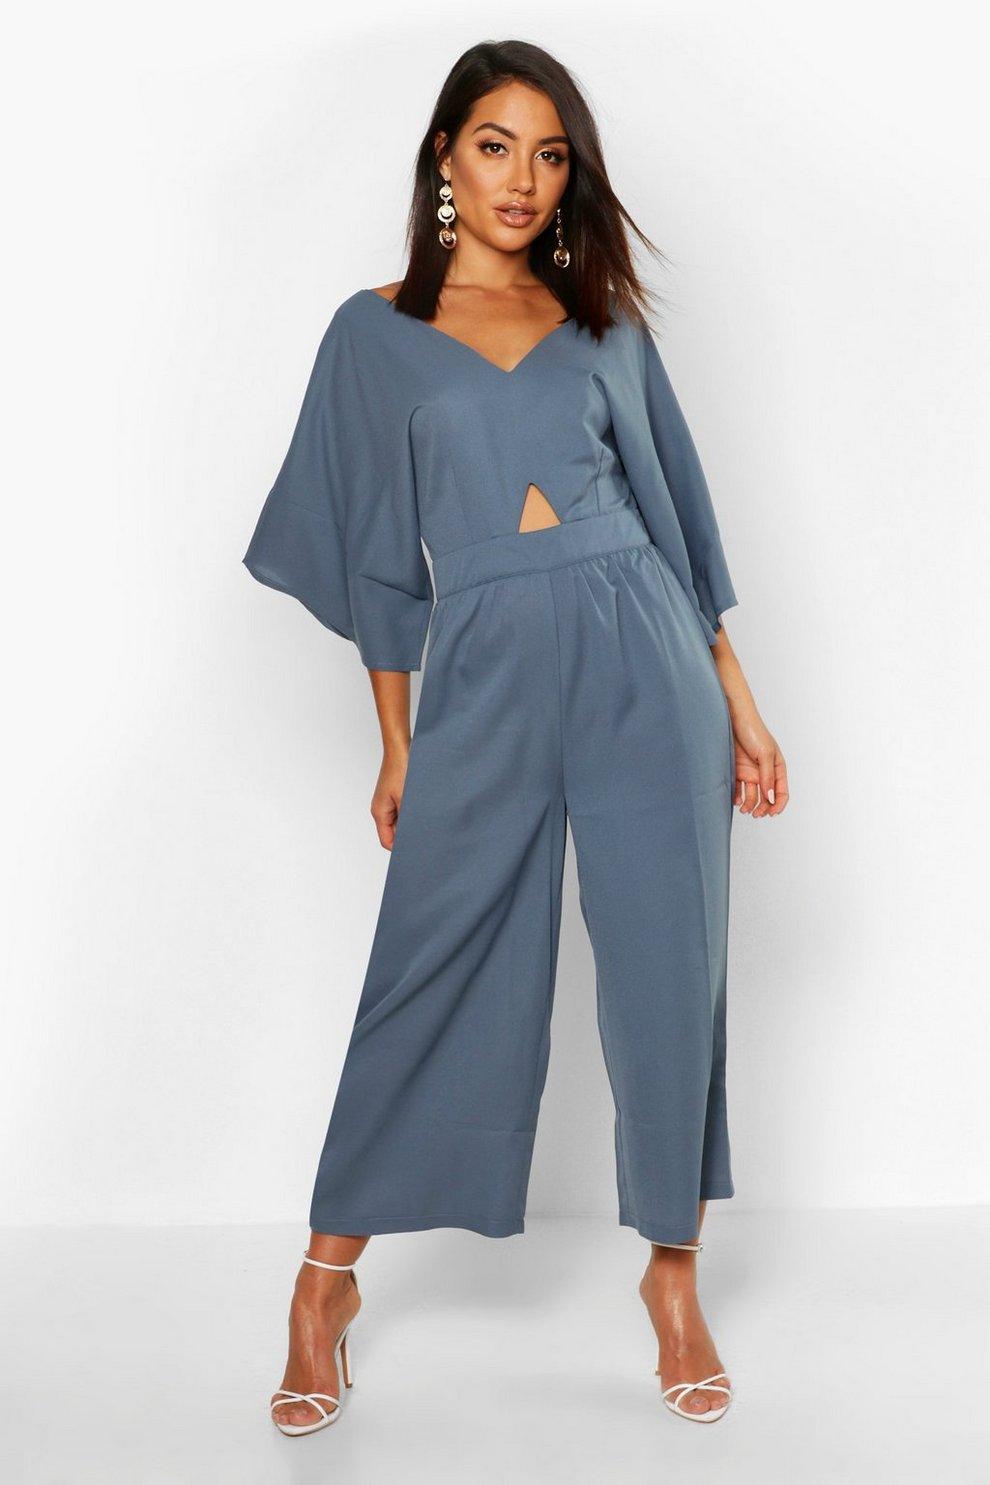 free delivery shop affordable price Combinaison jupe-culotte à manches kimono   Boohoo